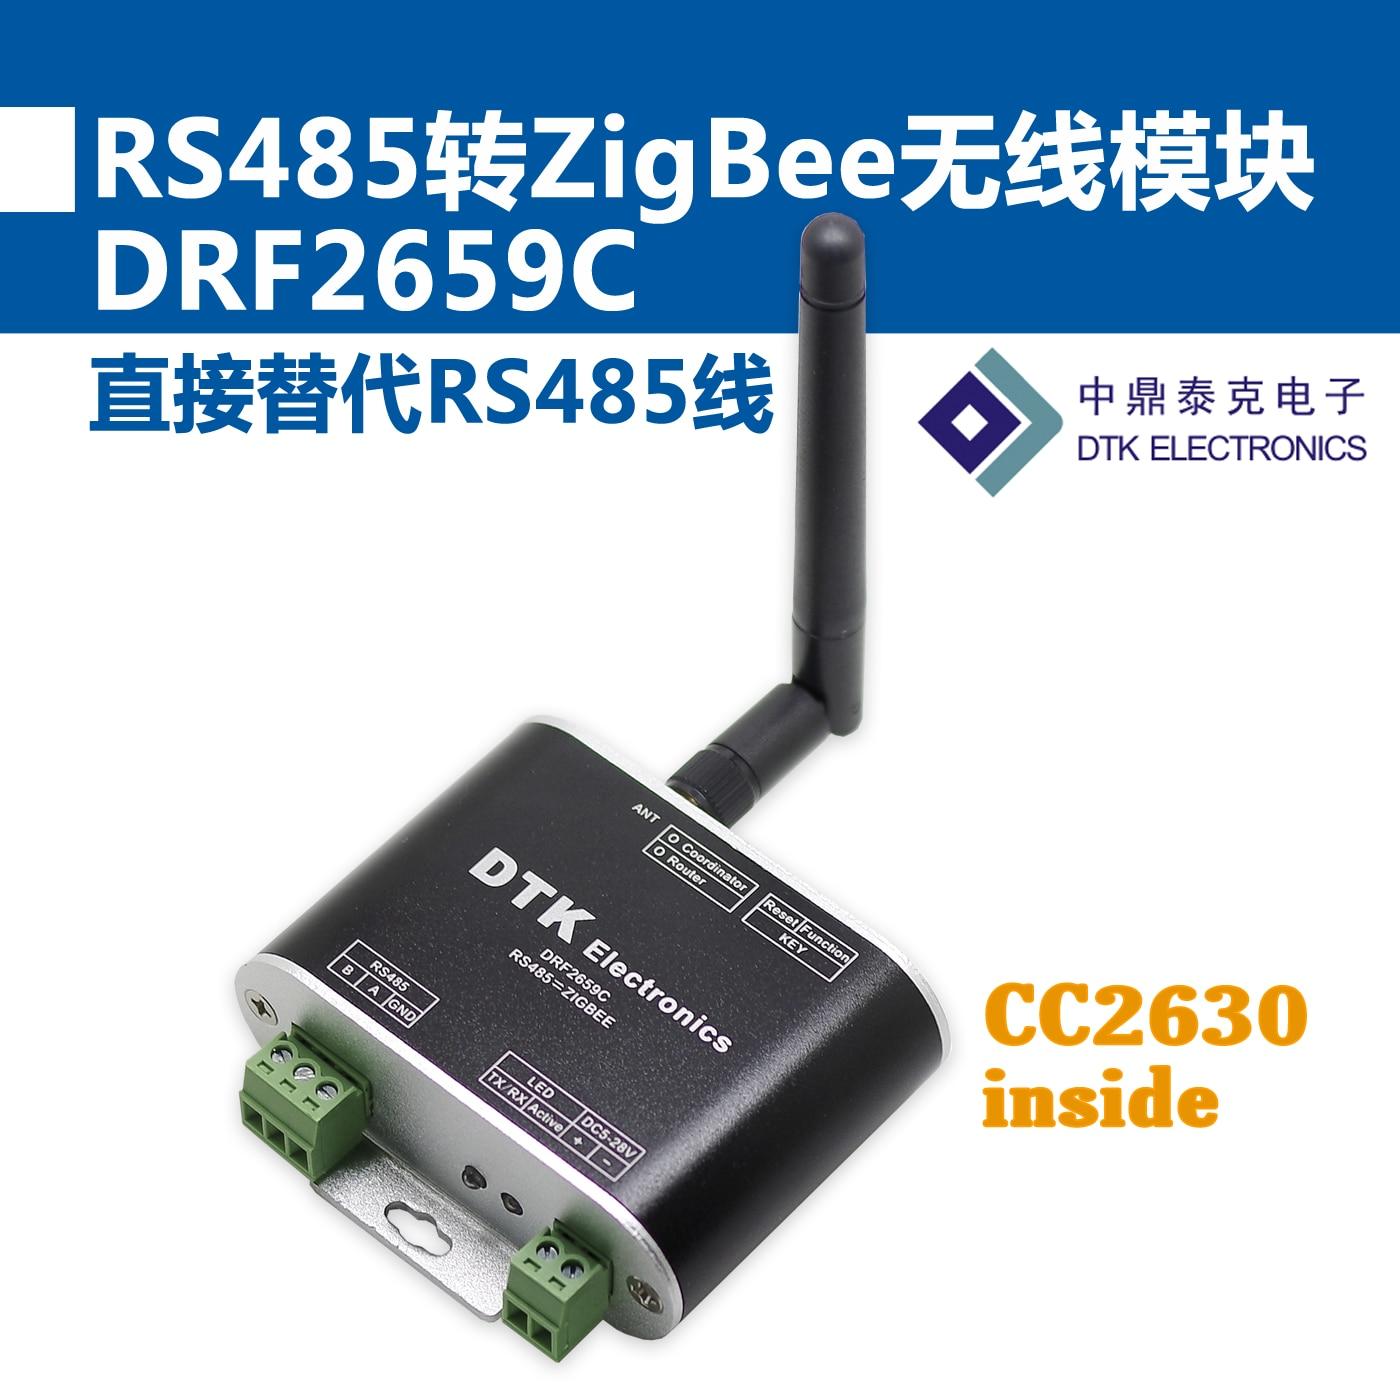 RS485 إلى وحدة زيجبي اللاسلكية (نقل 1.6 كجم ، رقاقة CC2630 ، سوبر) DRF2659C